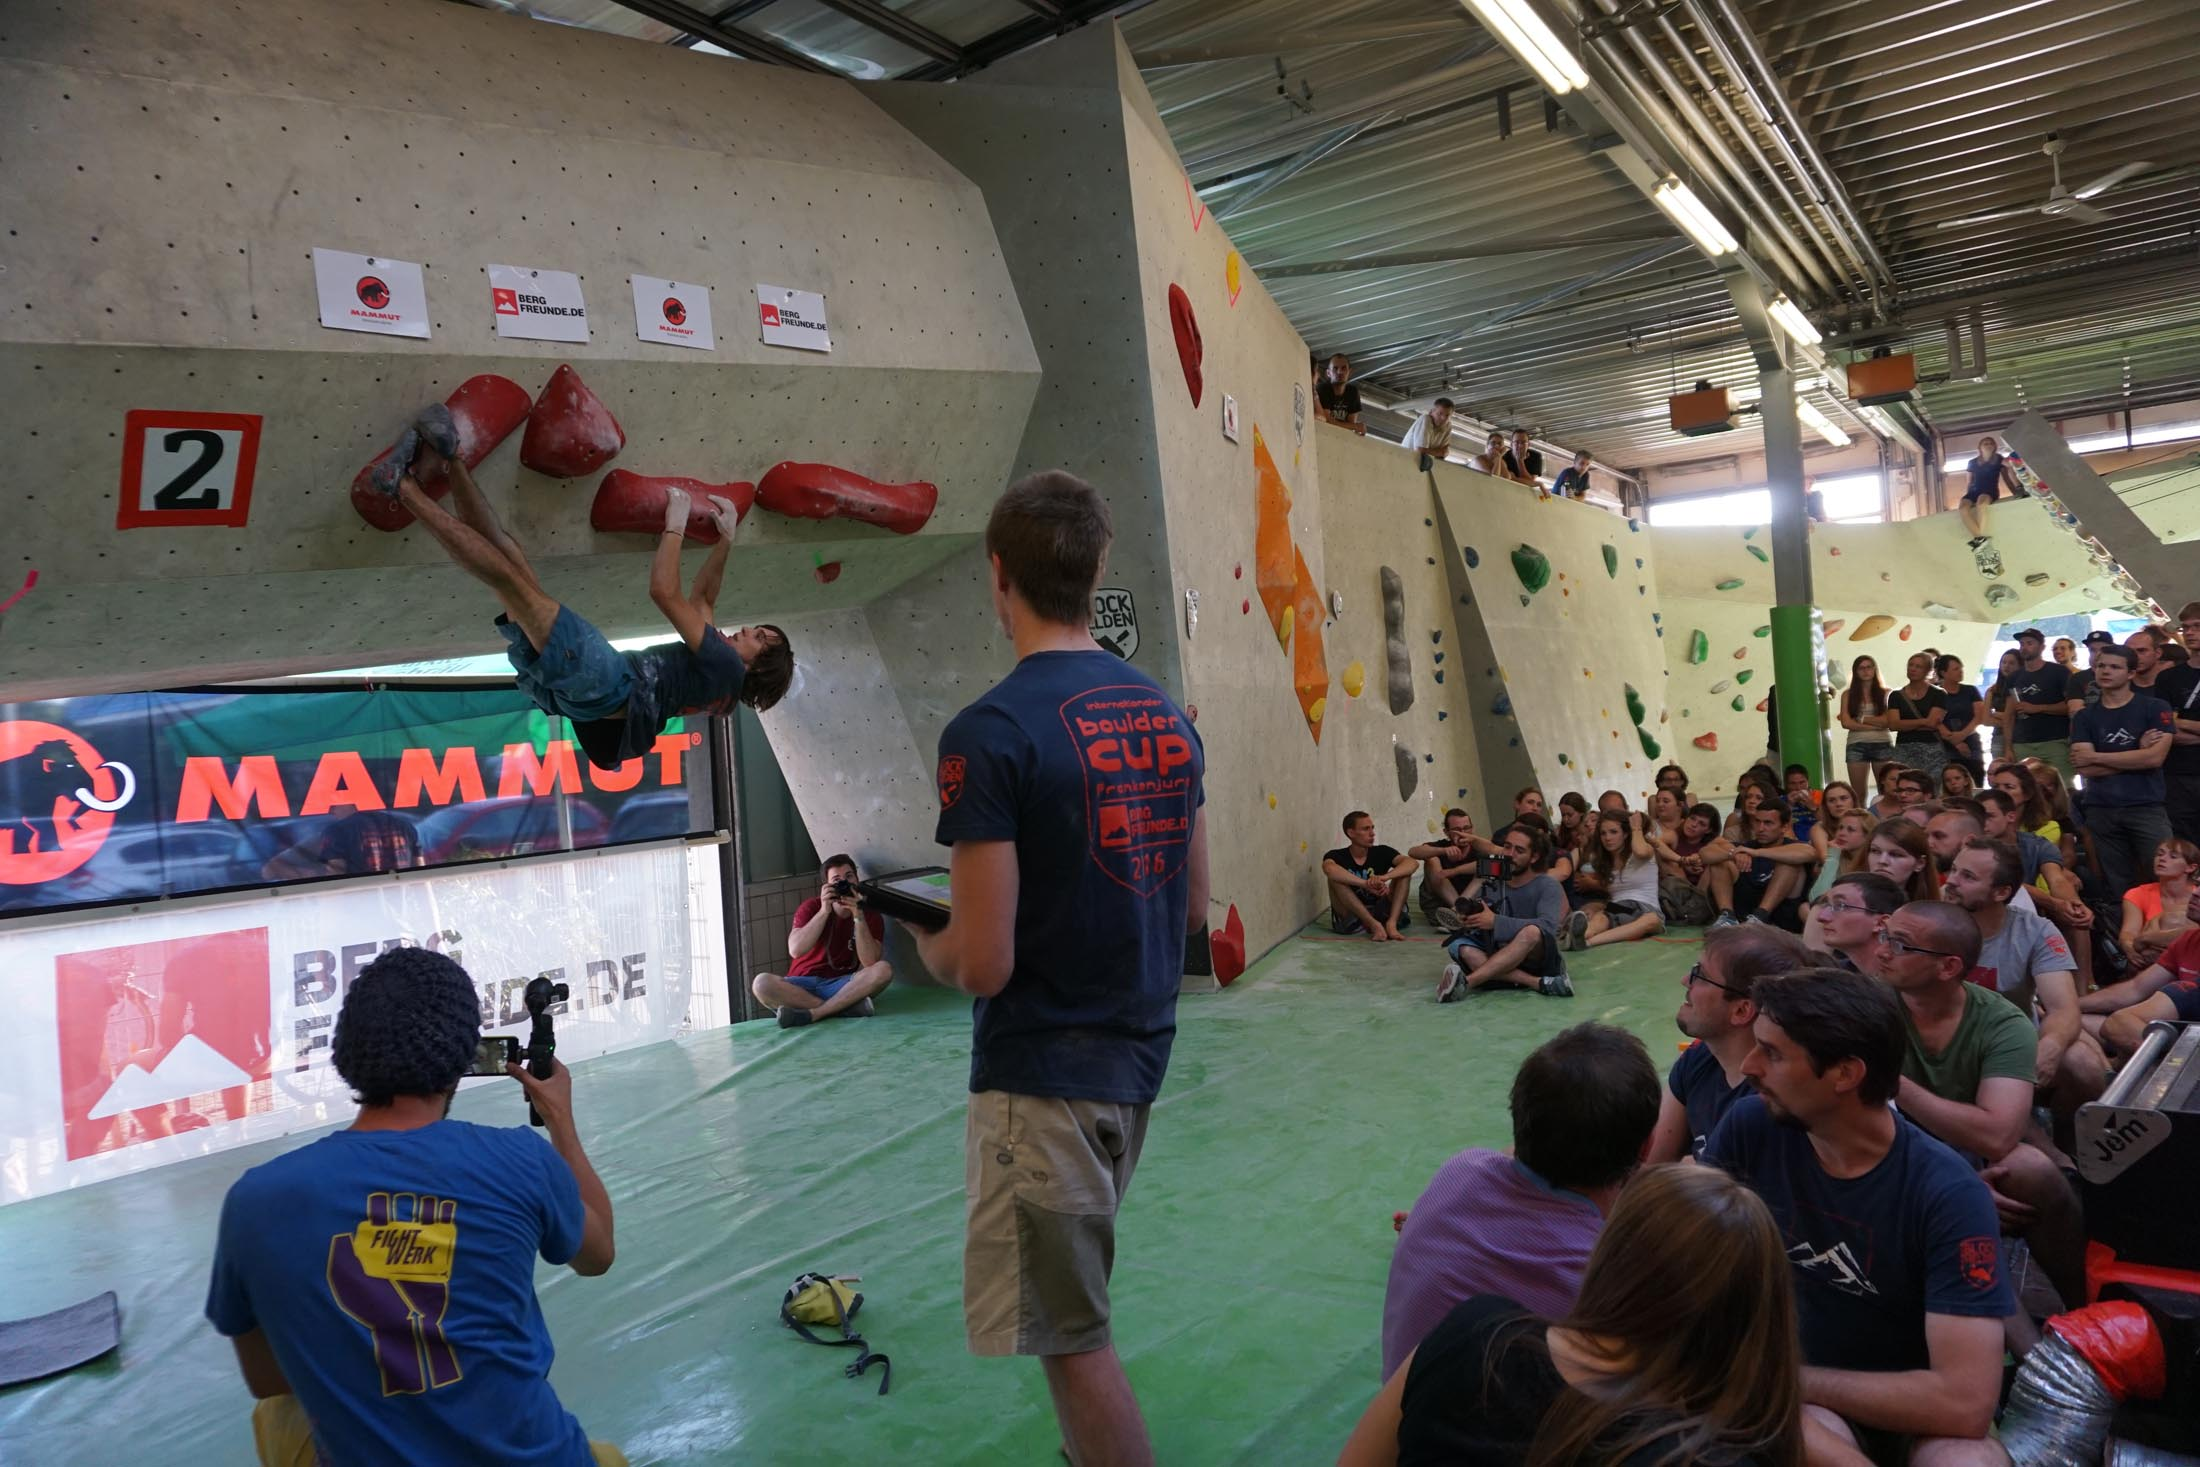 Finale, internationaler bouldercup Frankenjura 2016, BLOCKHELDEN Erlangen, Mammut, Bergfreunde.de, Boulderwettkampf07092016611